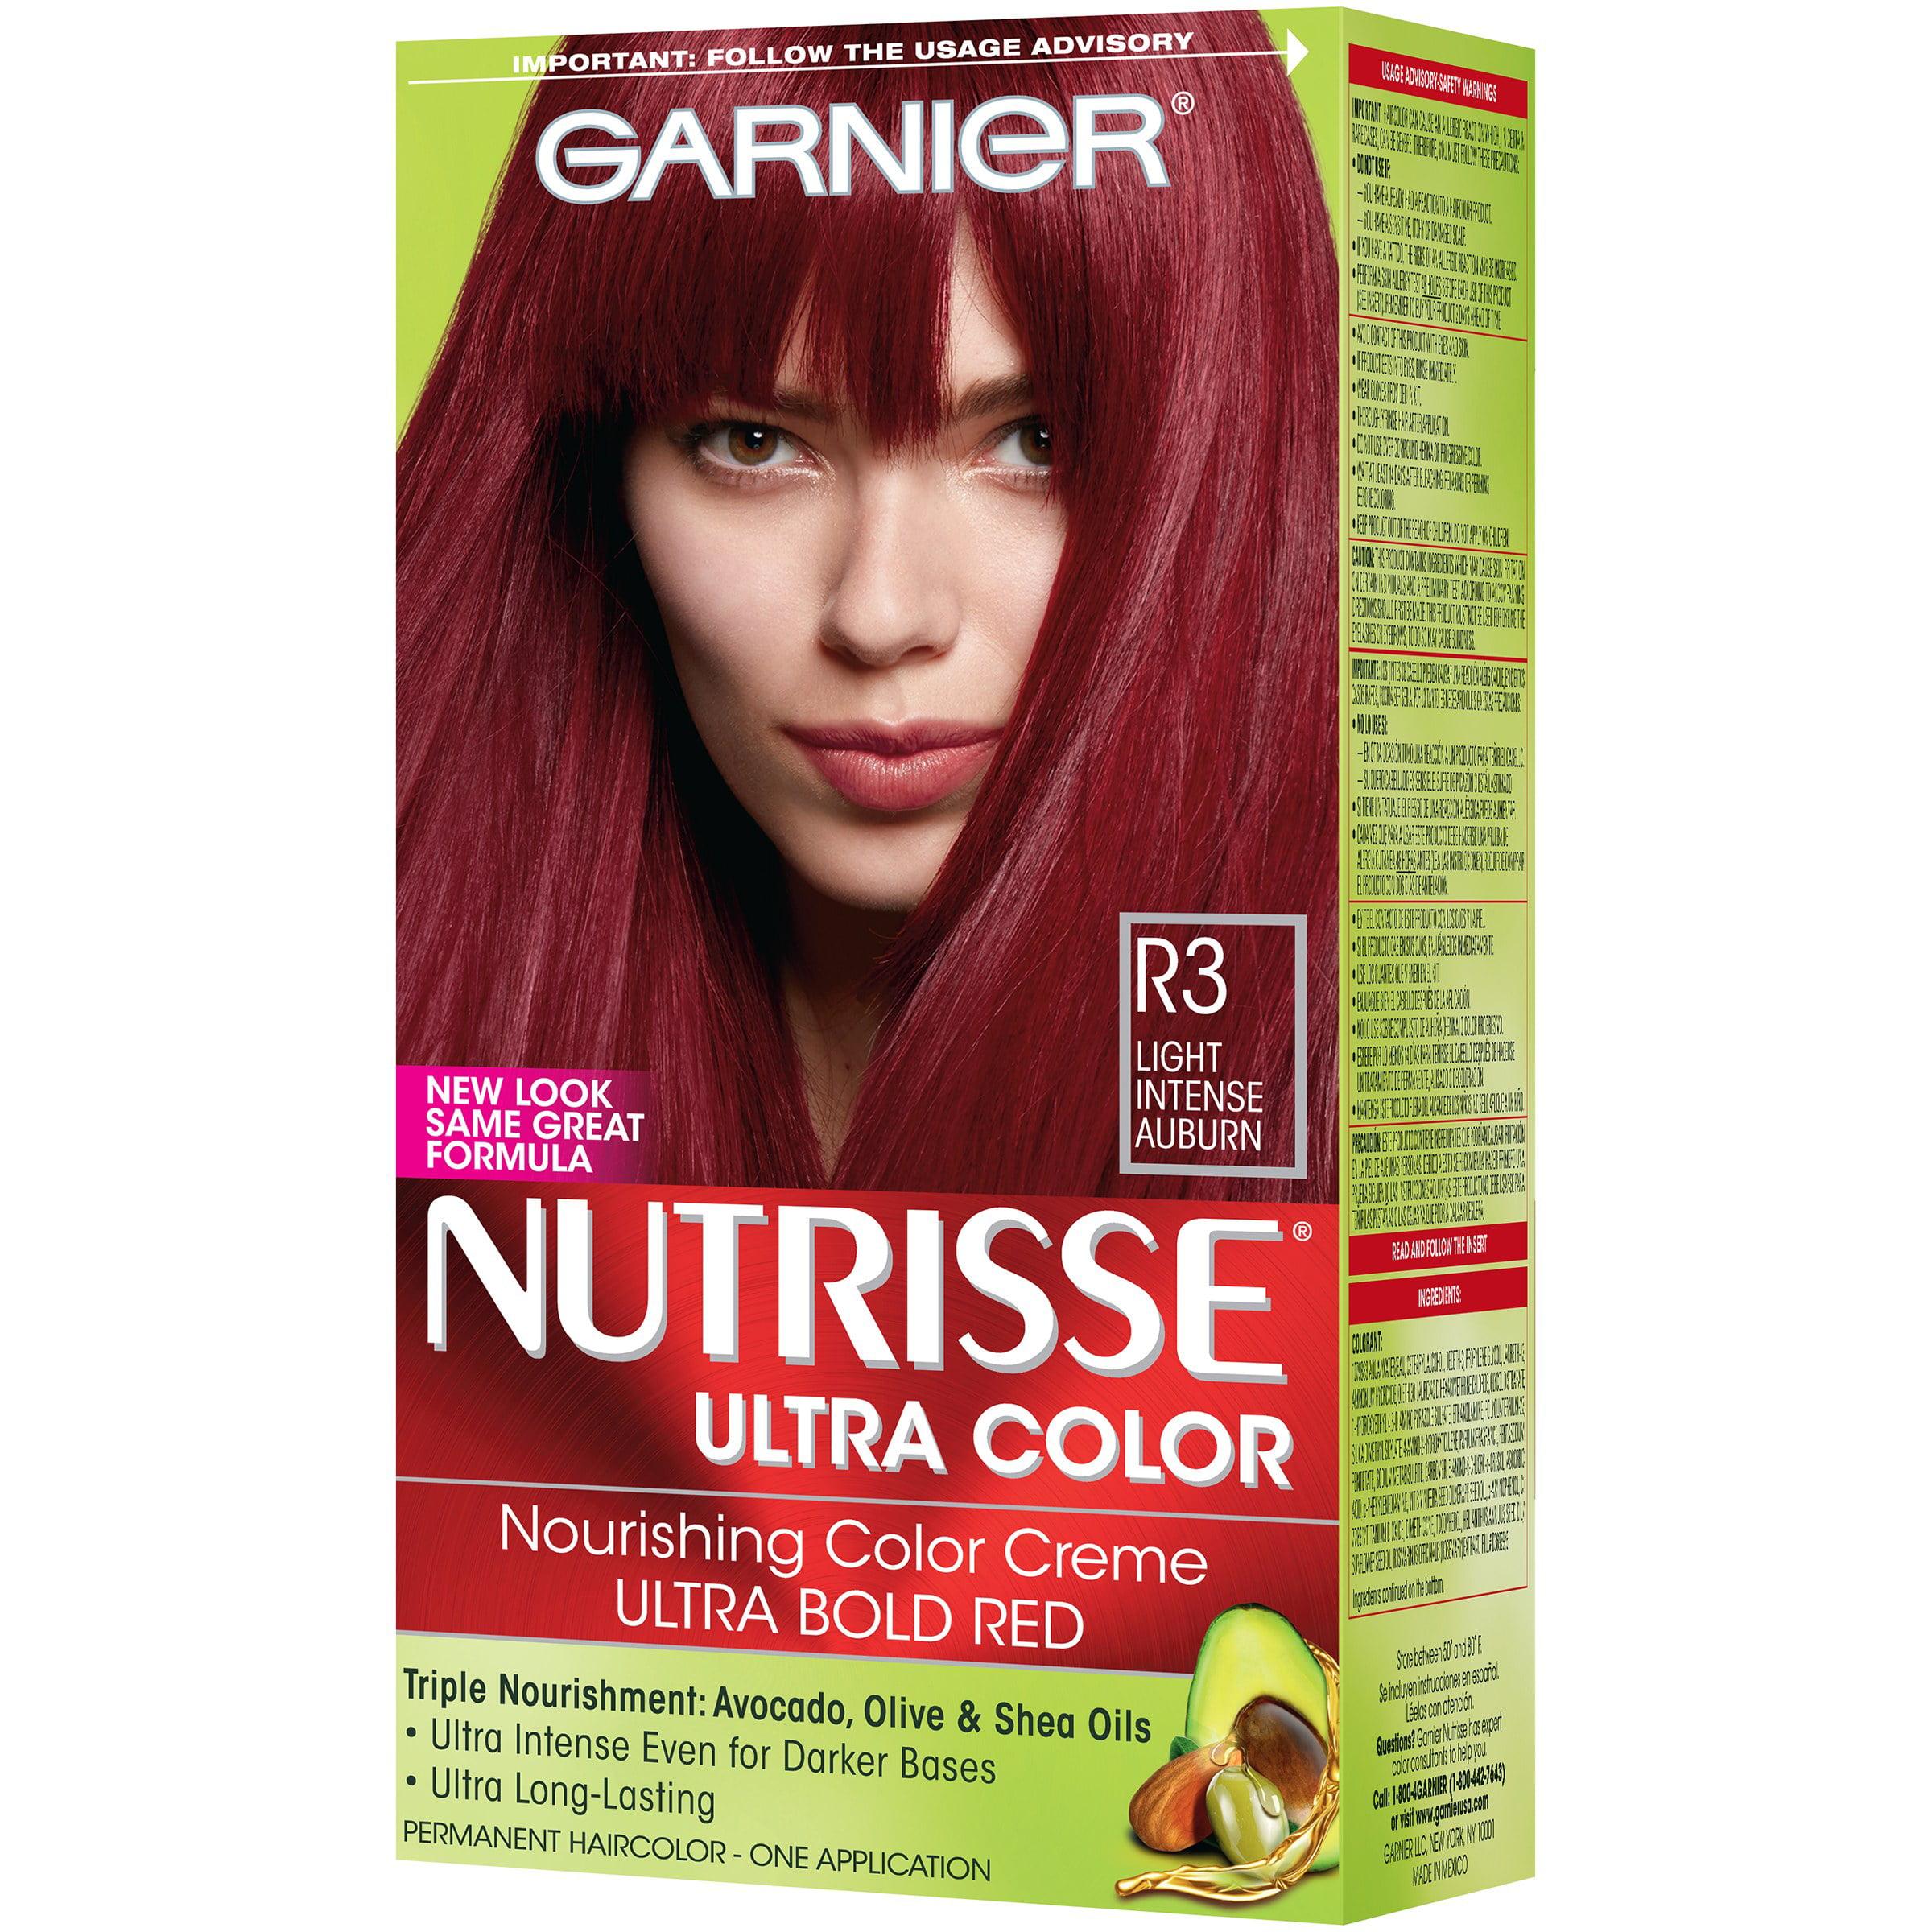 Garnier nutrisse hair color cocoa bean dark golden brownjpg dark hair nvjuhfo Image collections